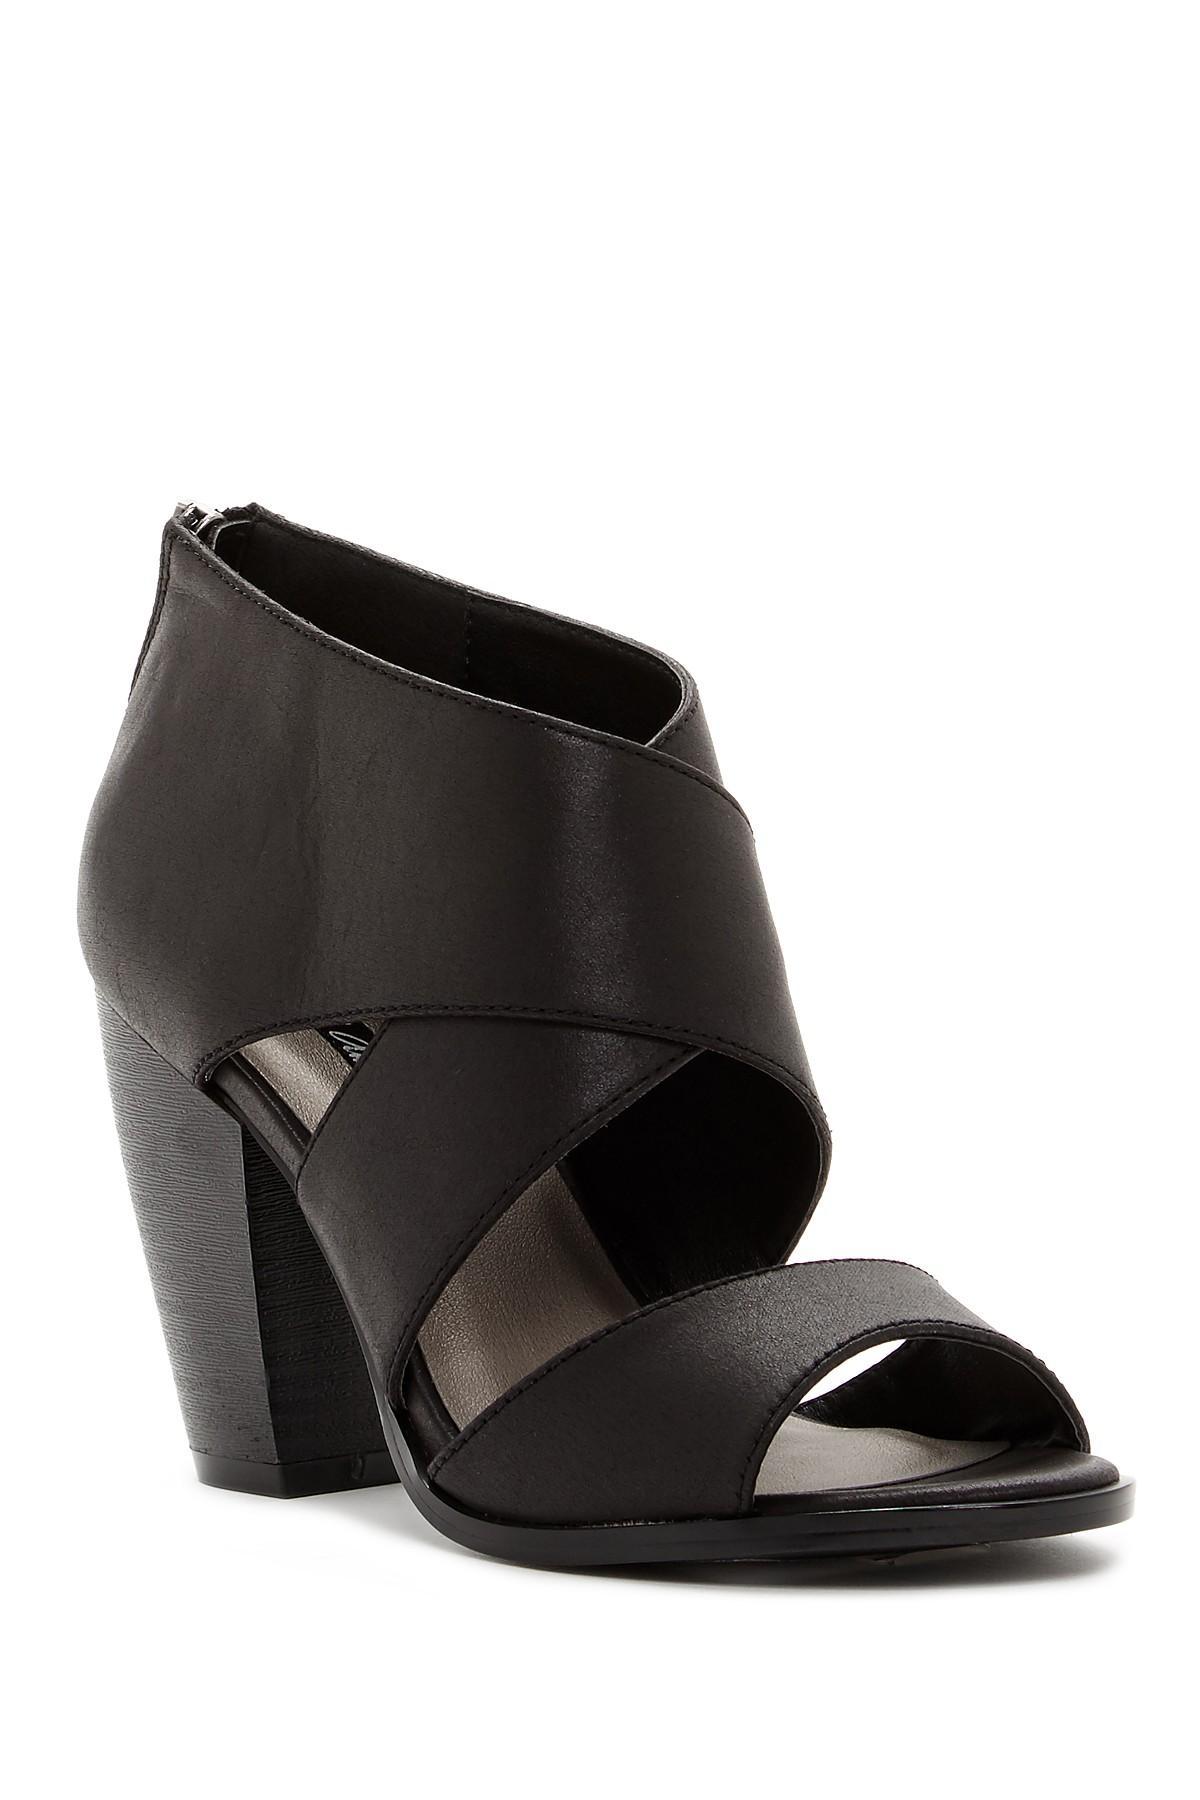 Black sandals myer - Gallery